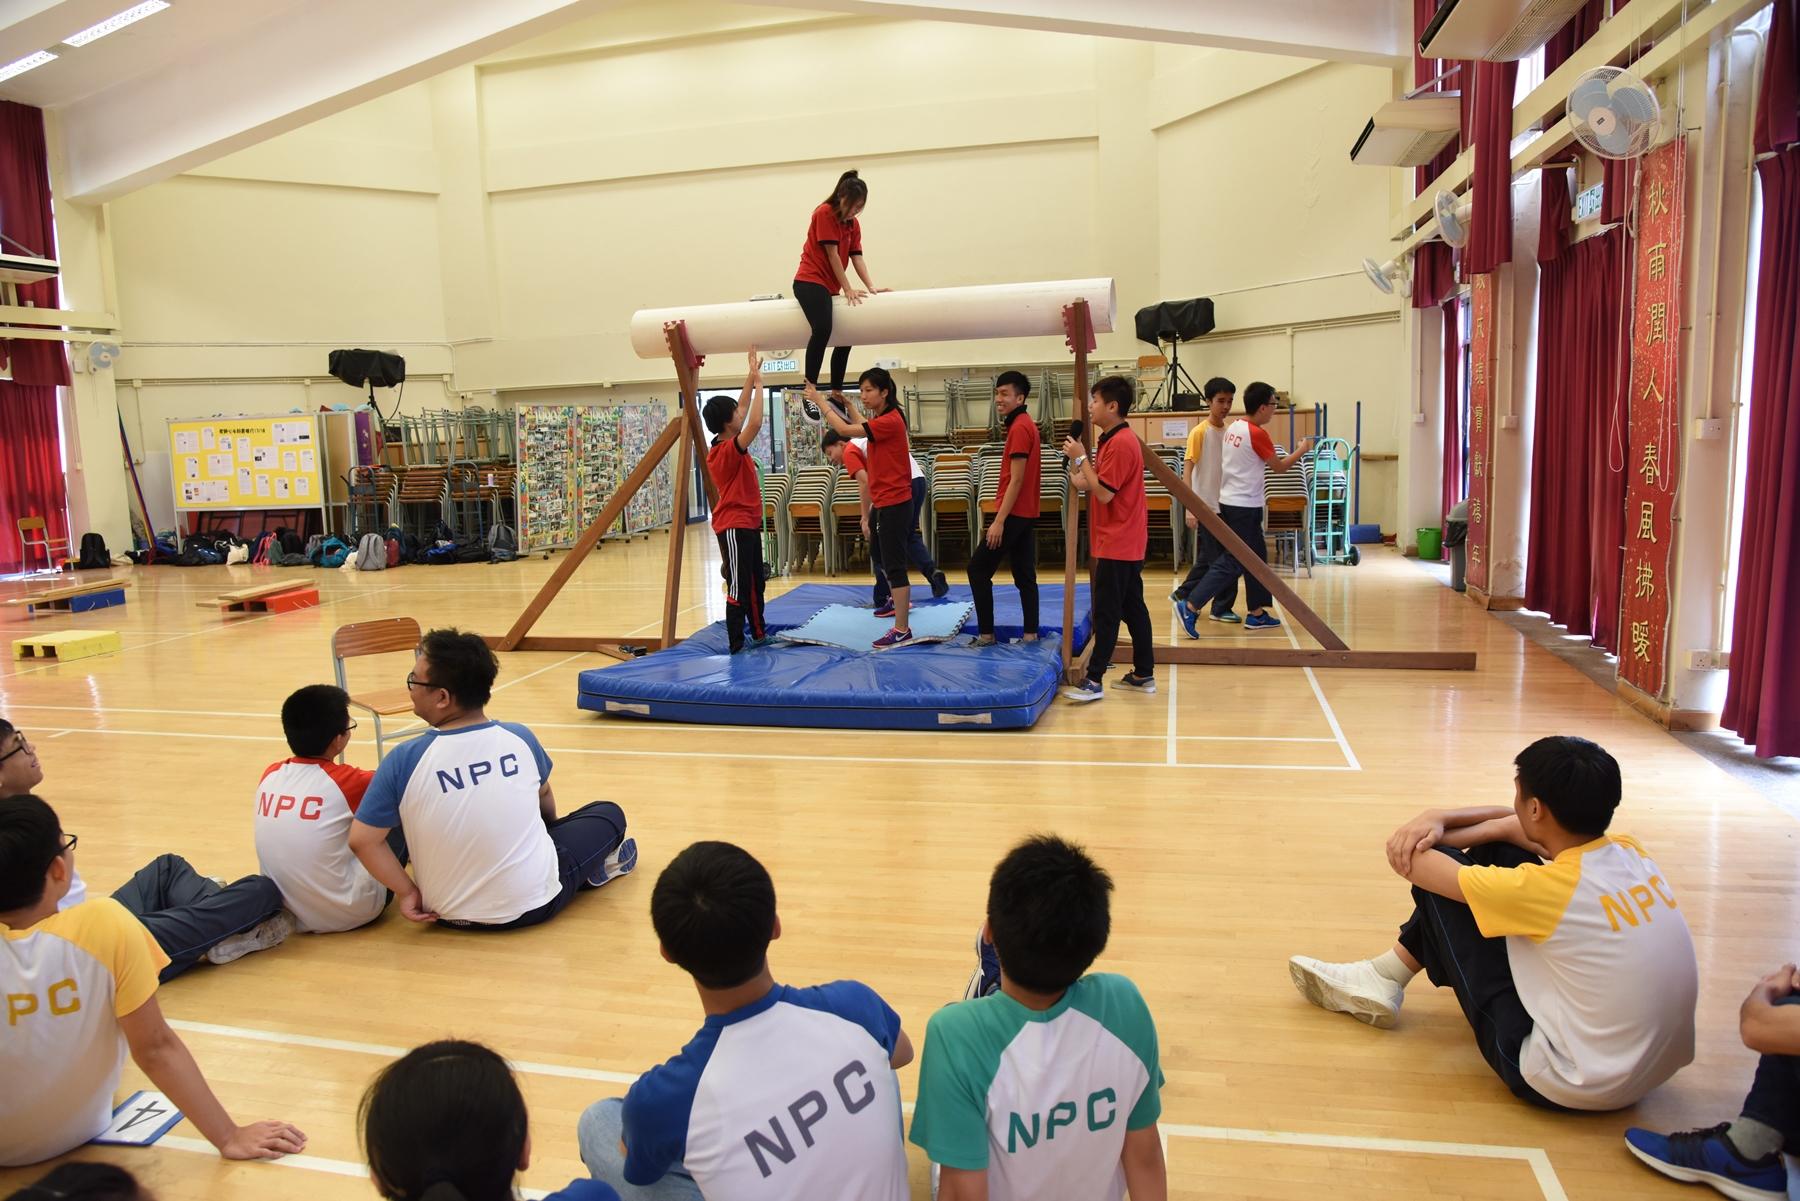 http://npc.edu.hk/sites/default/files/dsc_5911.jpg